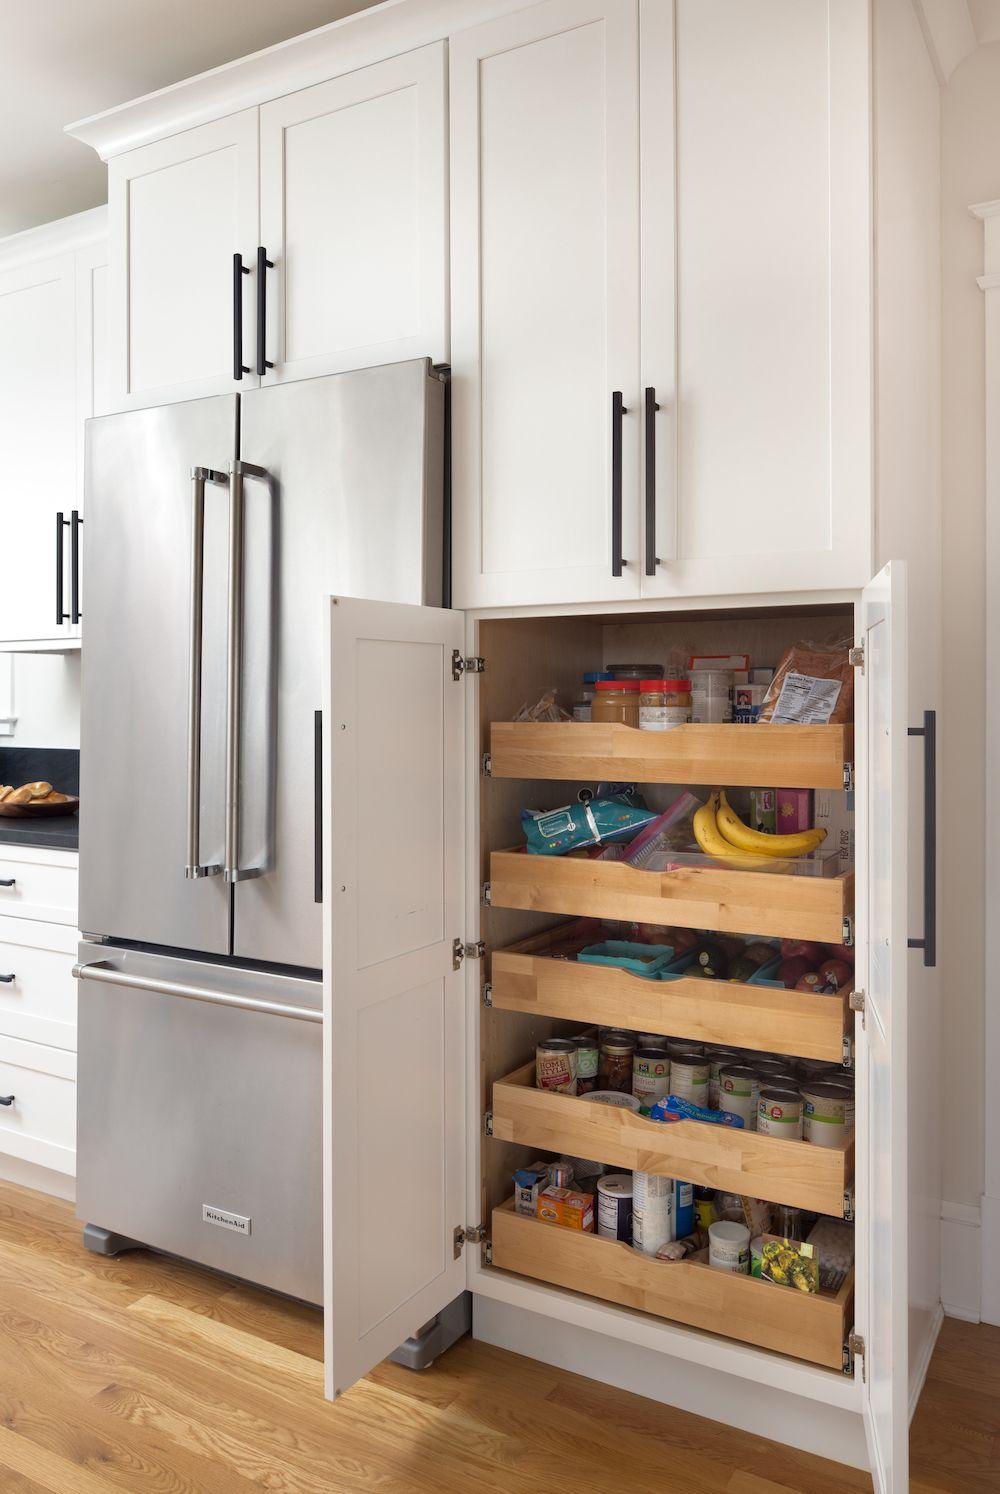 Kitchen Pantry Shaker Cabinets Arlington Va Pantry Design Kitchen Pantry Design Kitchen Remodel